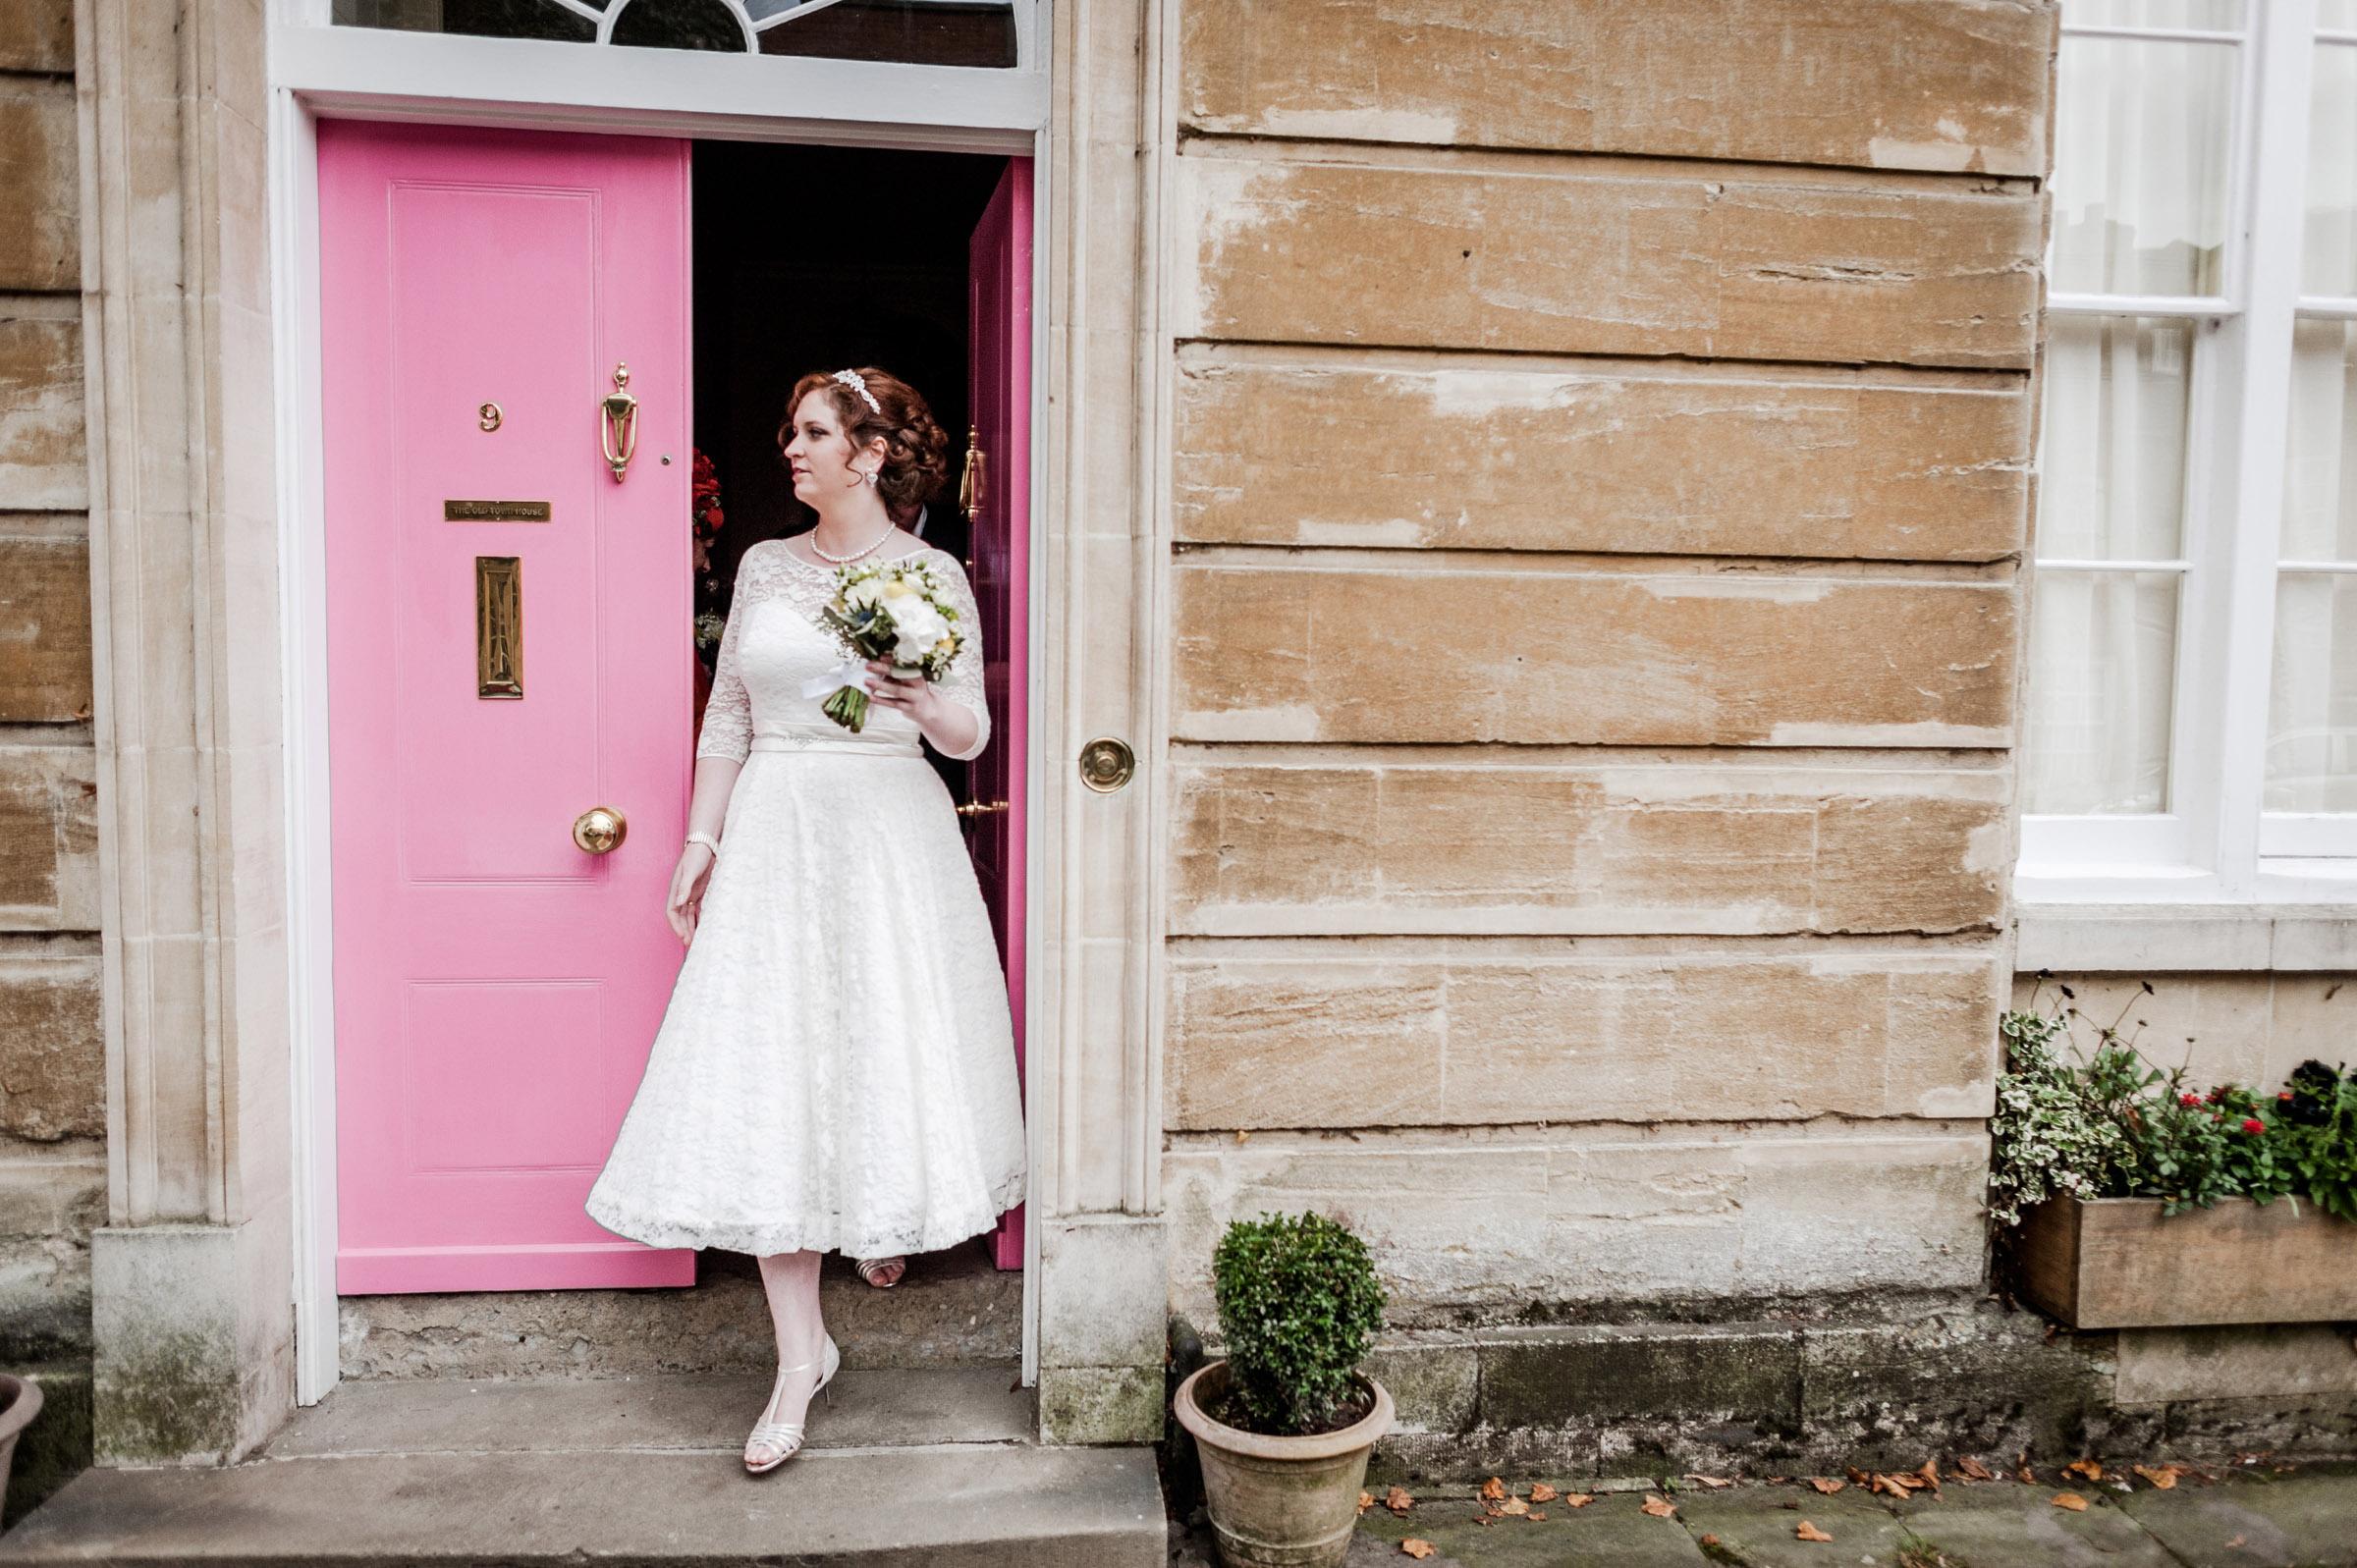 Ashmolean-Museum-Wedding-Pictures-0018.jpg